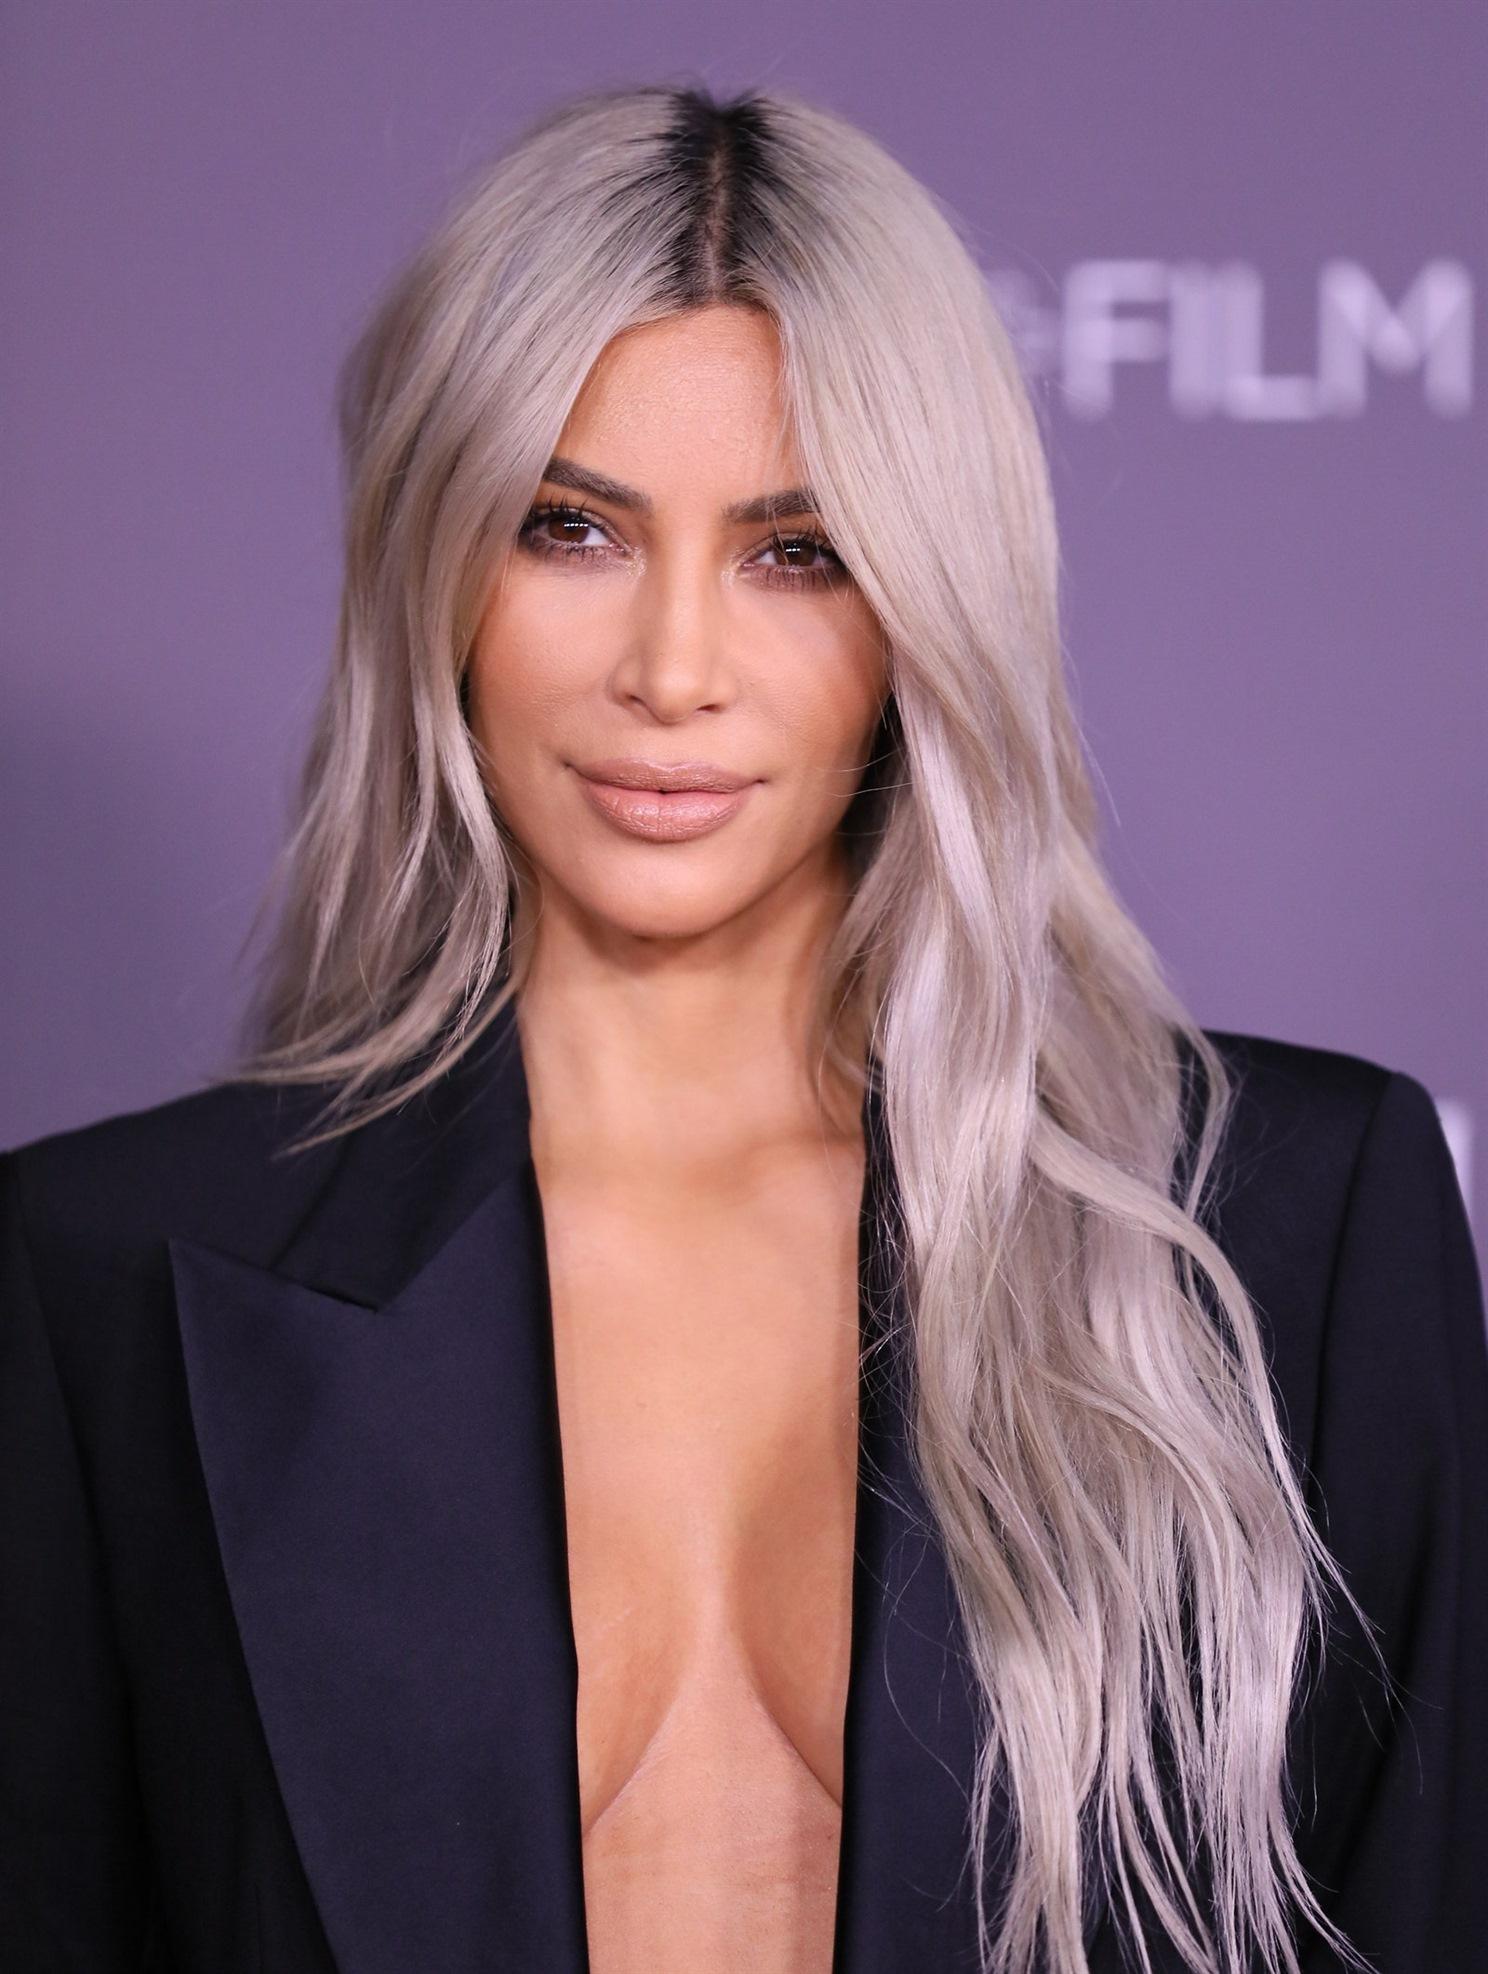 Frisuren 2021 Frauen Haarfarben